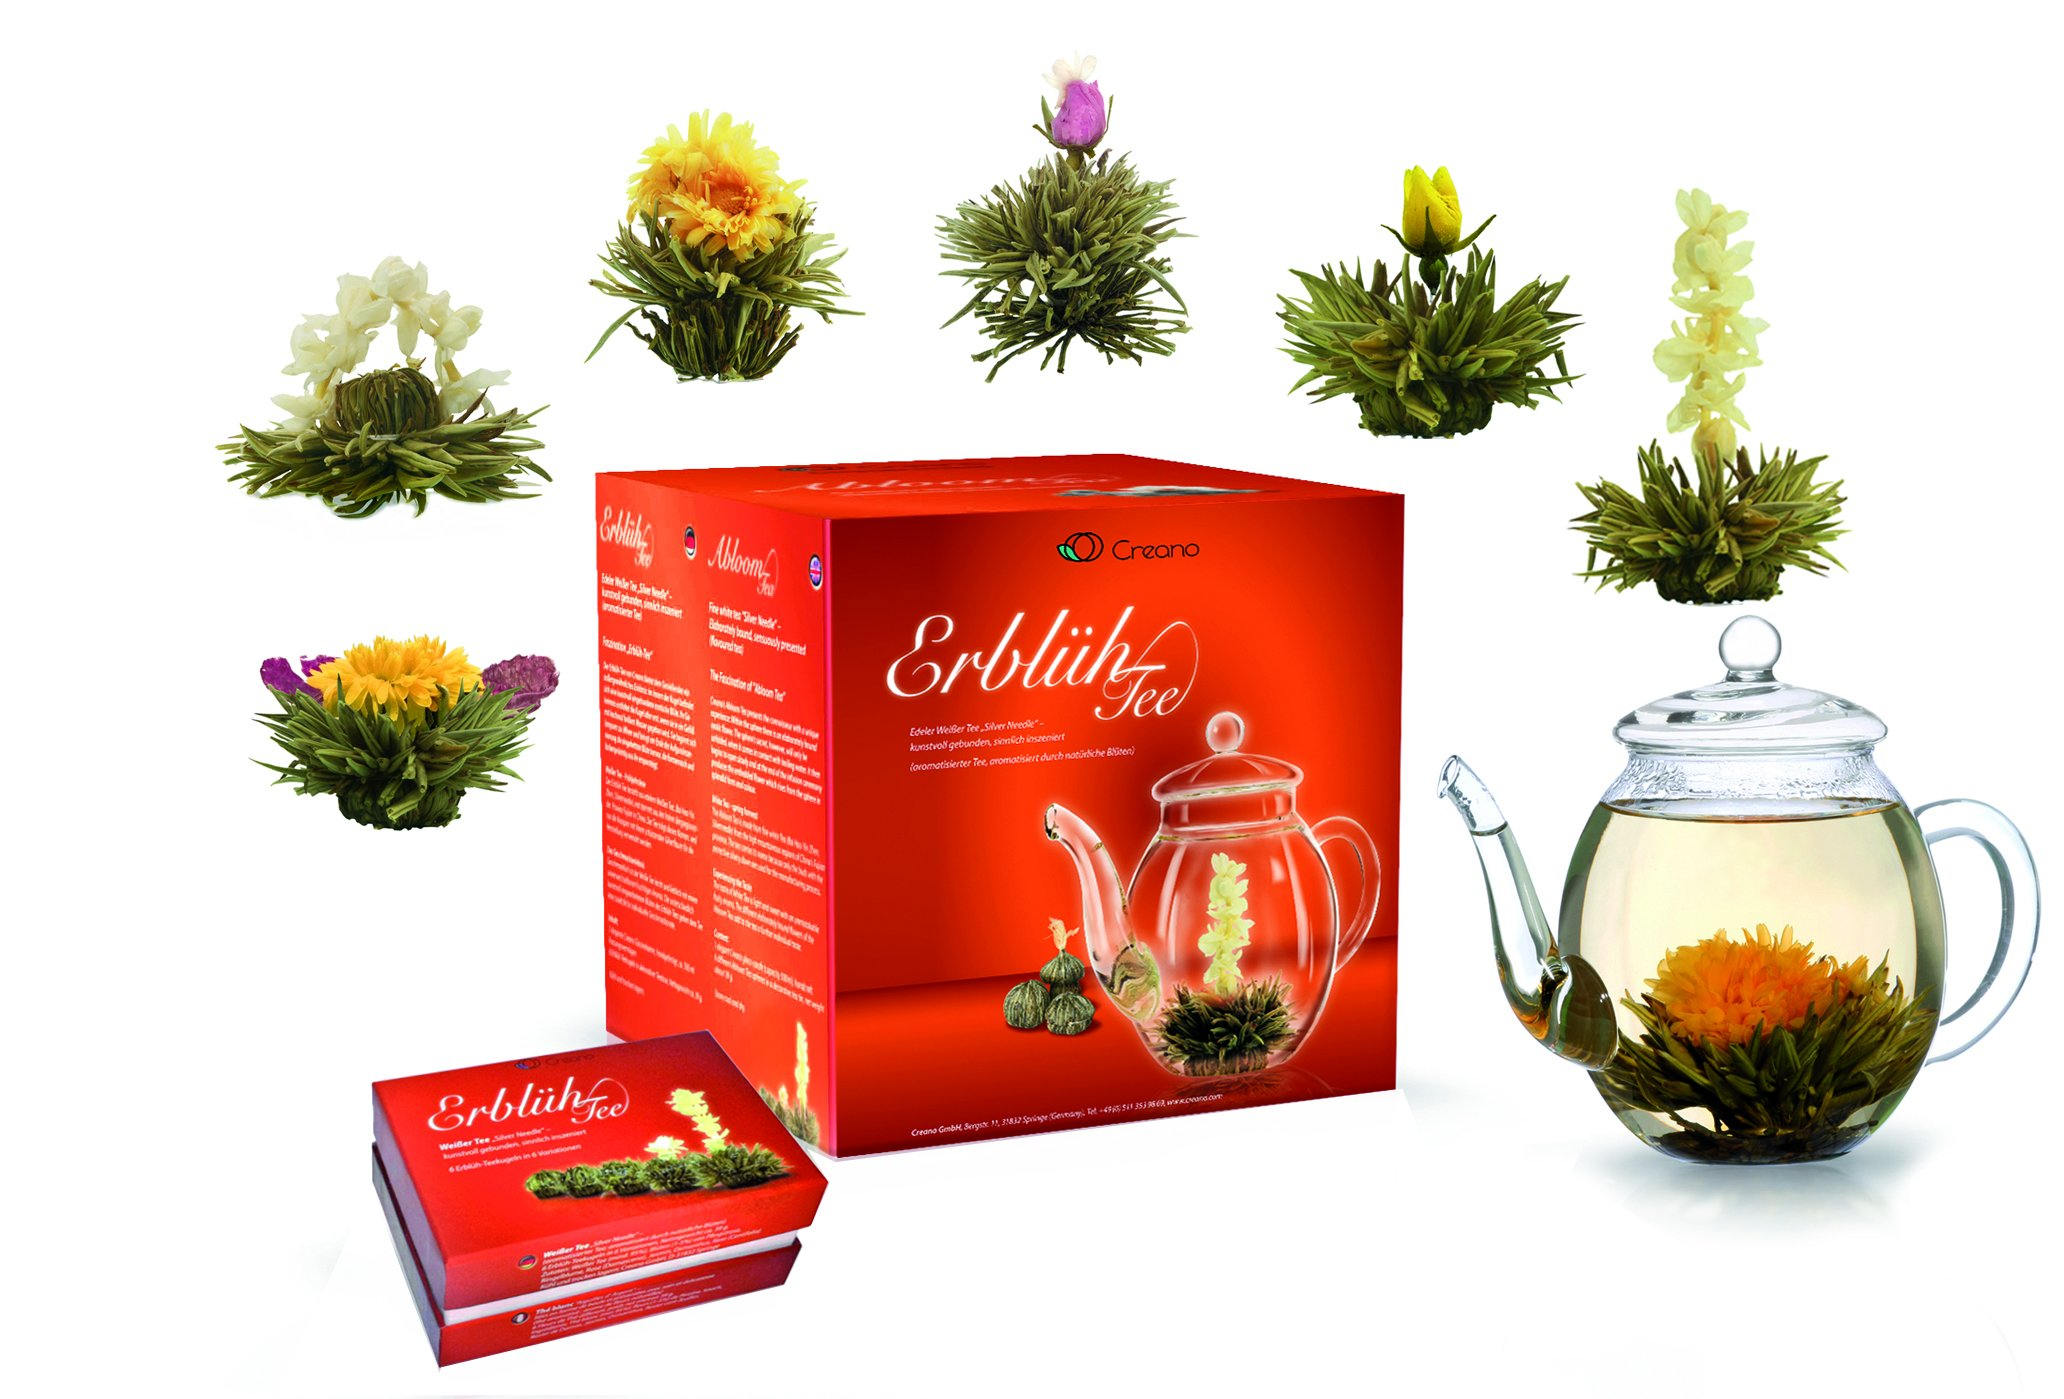 Creano-Teeblumen-Mix-GeschenksetErblhTee-mit-Glaskanne-12-Teeblumen-in-Teekiste-aus-Holz-in-6-Sorten-Weitee